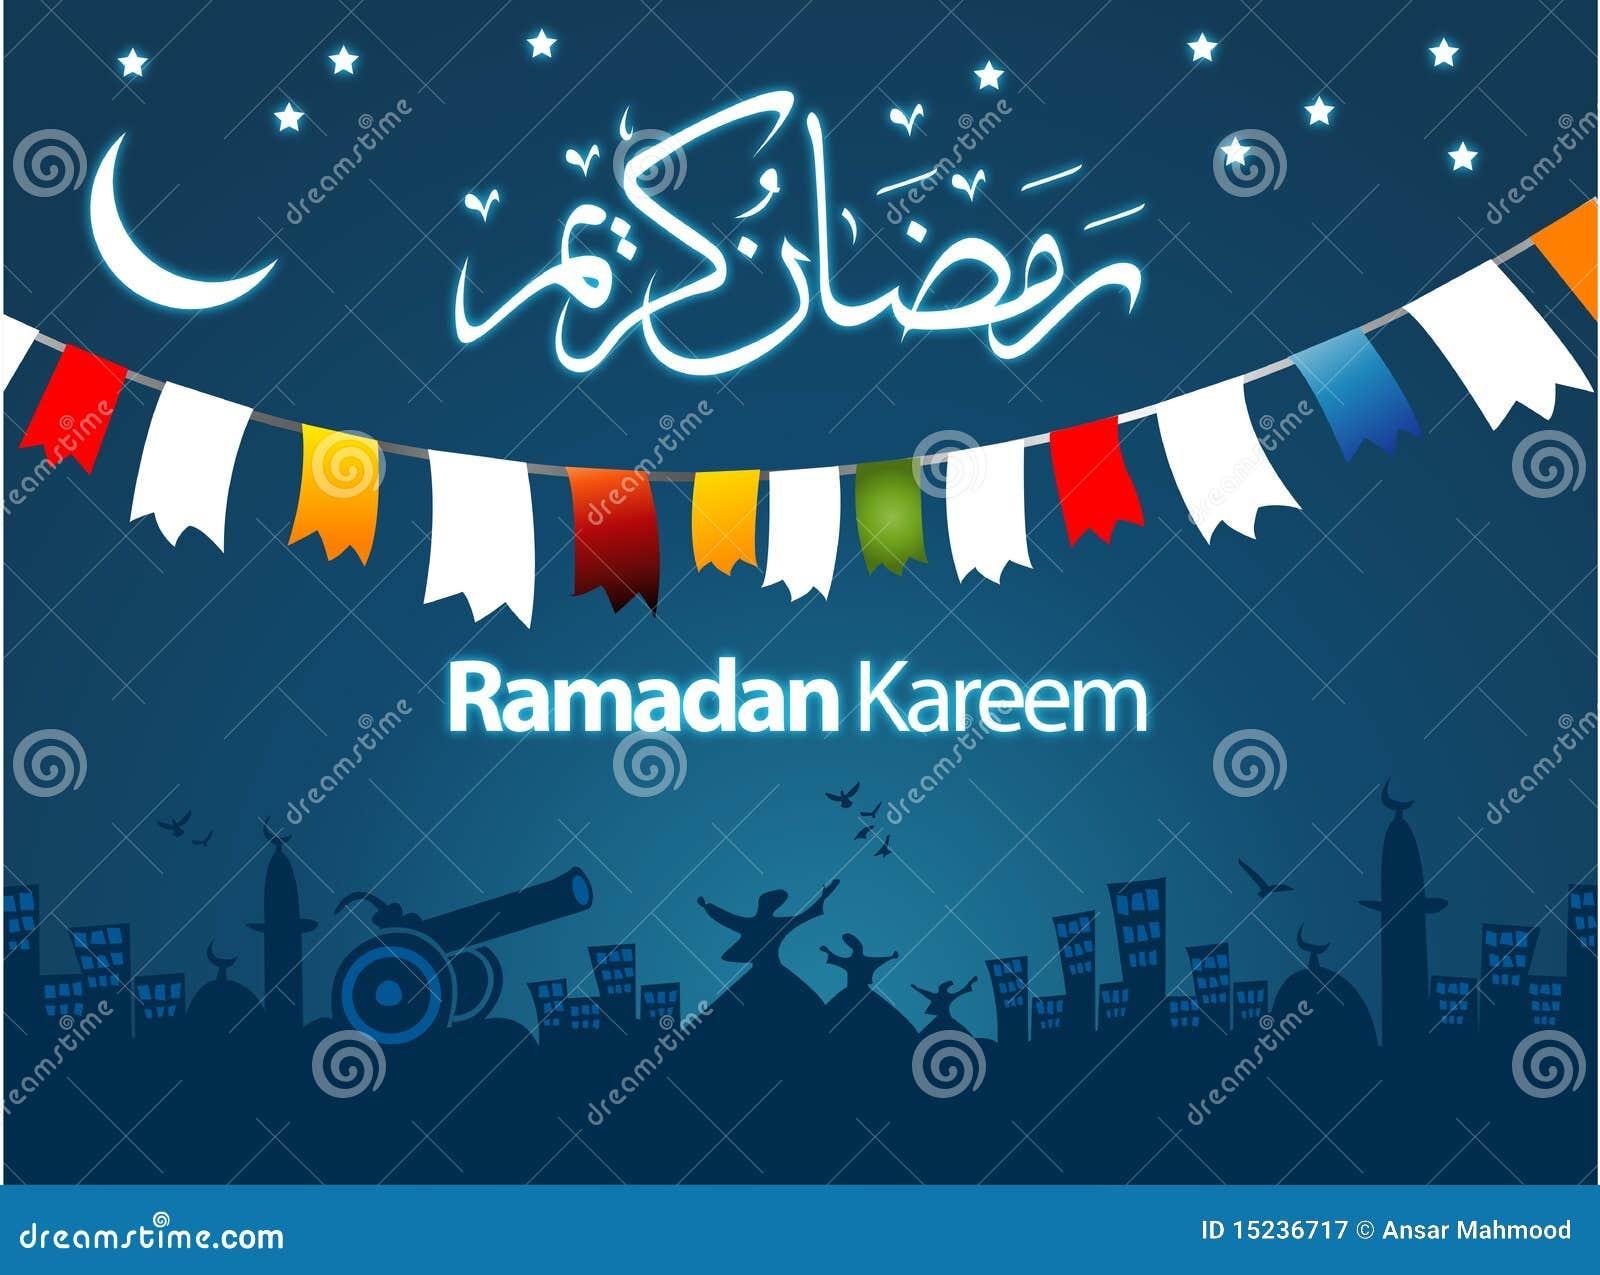 Ramadan greeting card illustration stock illustration illustration download ramadan greeting card illustration stock illustration illustration of middle elegant 15236717 m4hsunfo